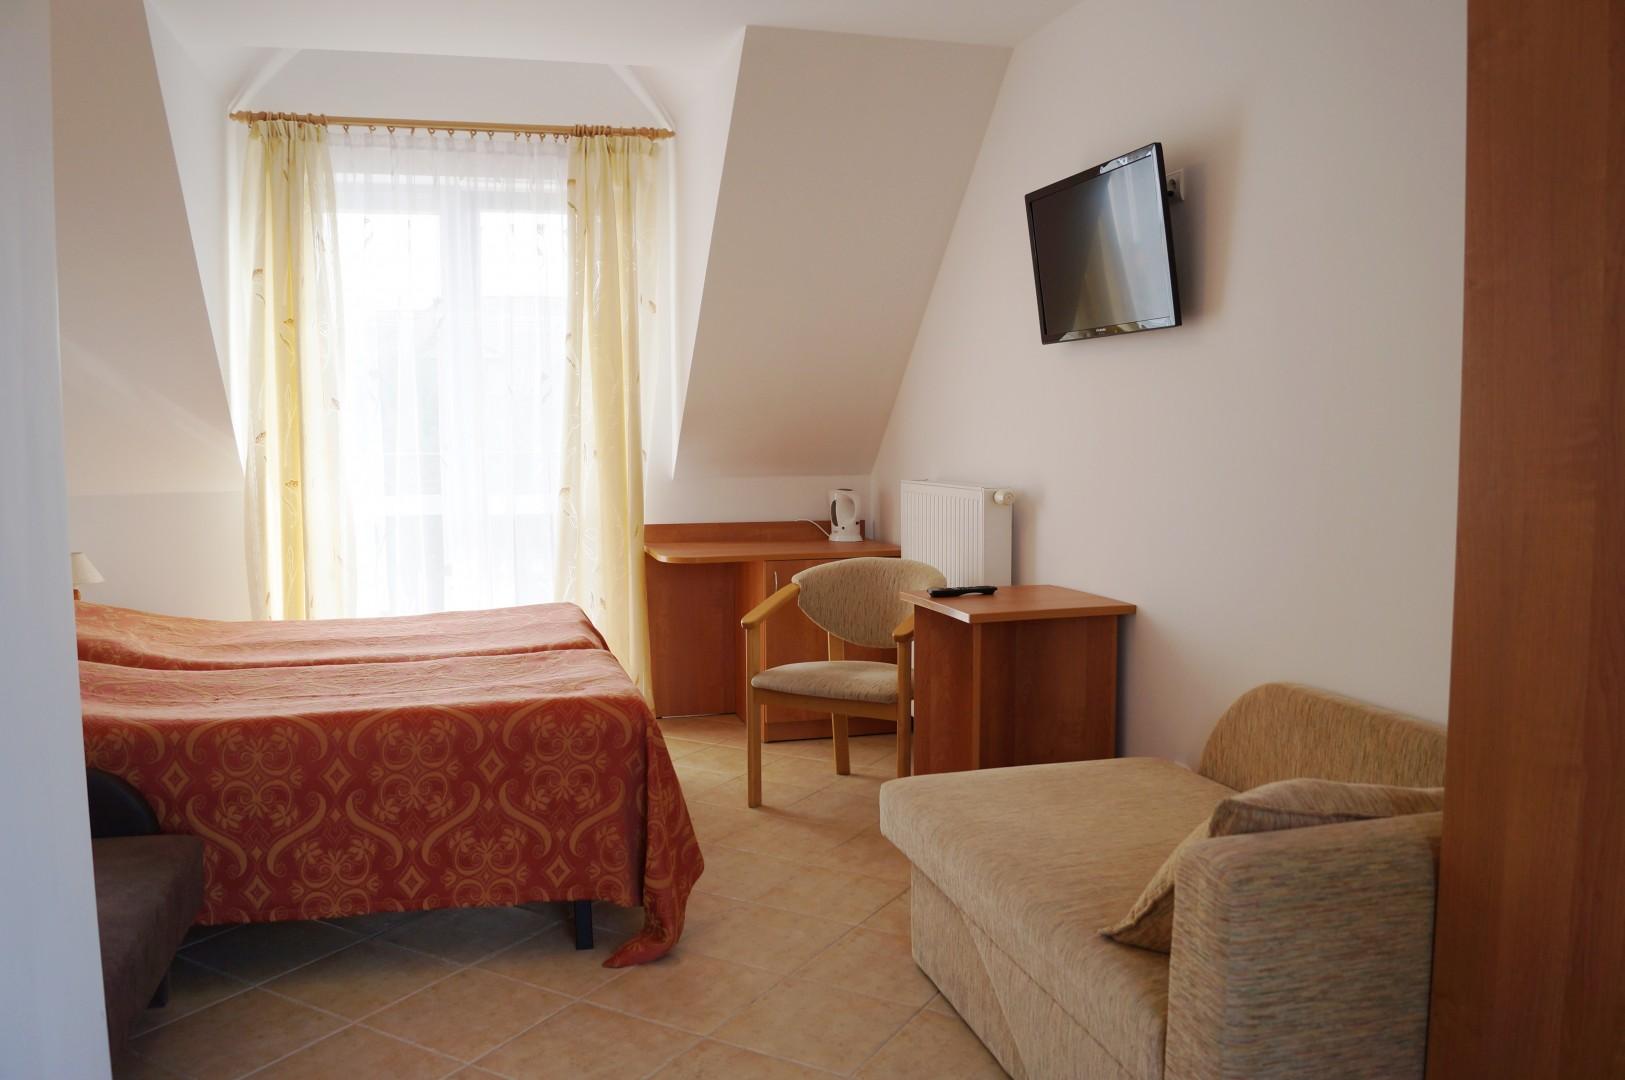 pokój na piętrze z balkonem.